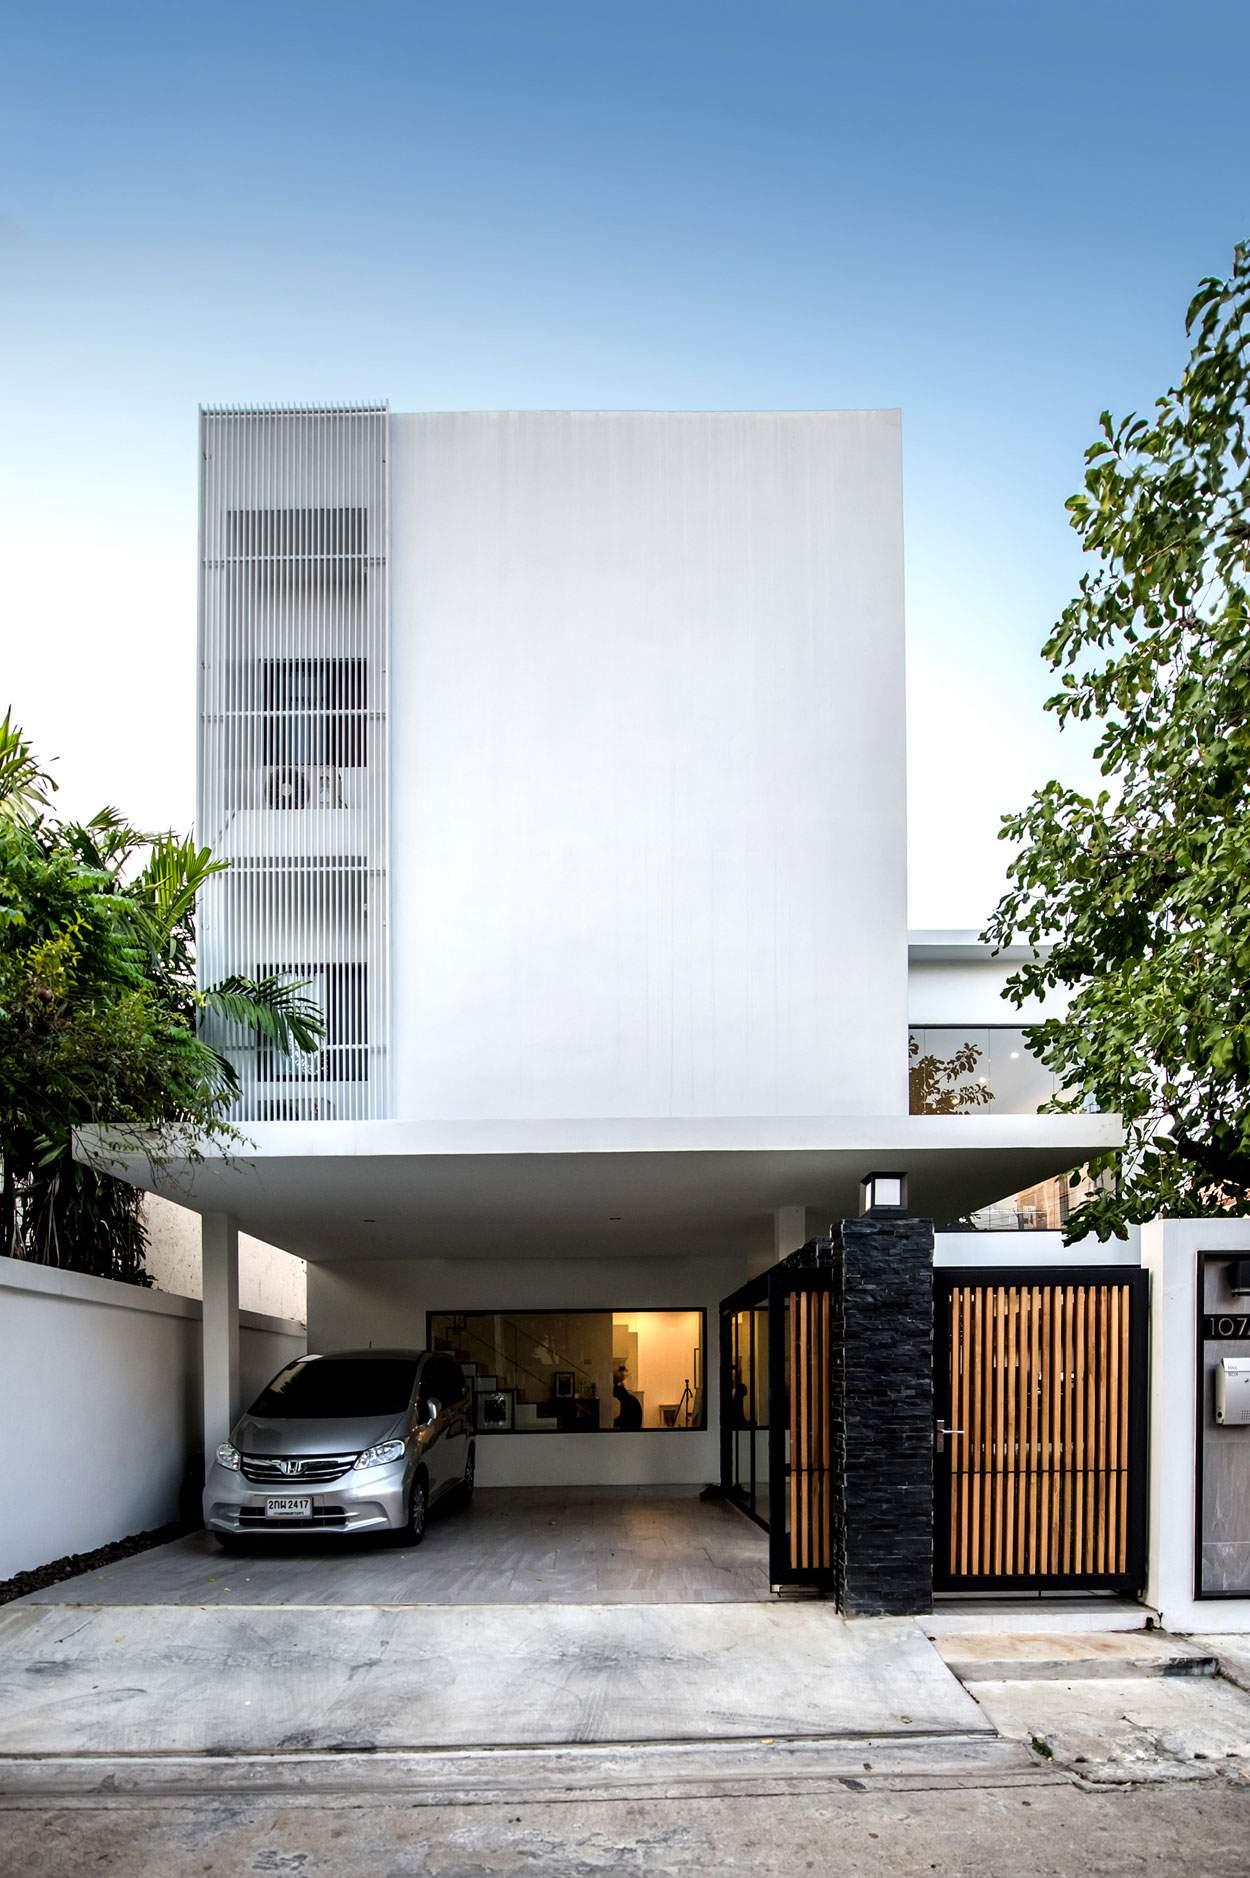 Дом в минималистическом стиле в Тайланде